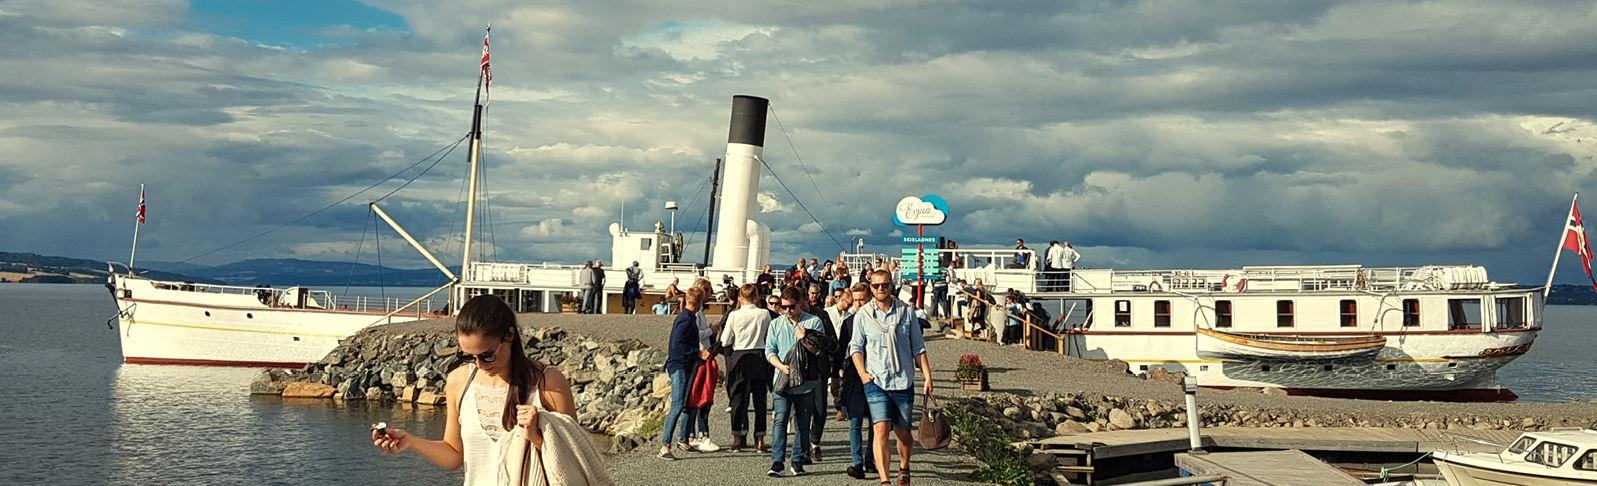 Opplevelser ved Mjøsa | Evjua Strandpark ved Mjøsa